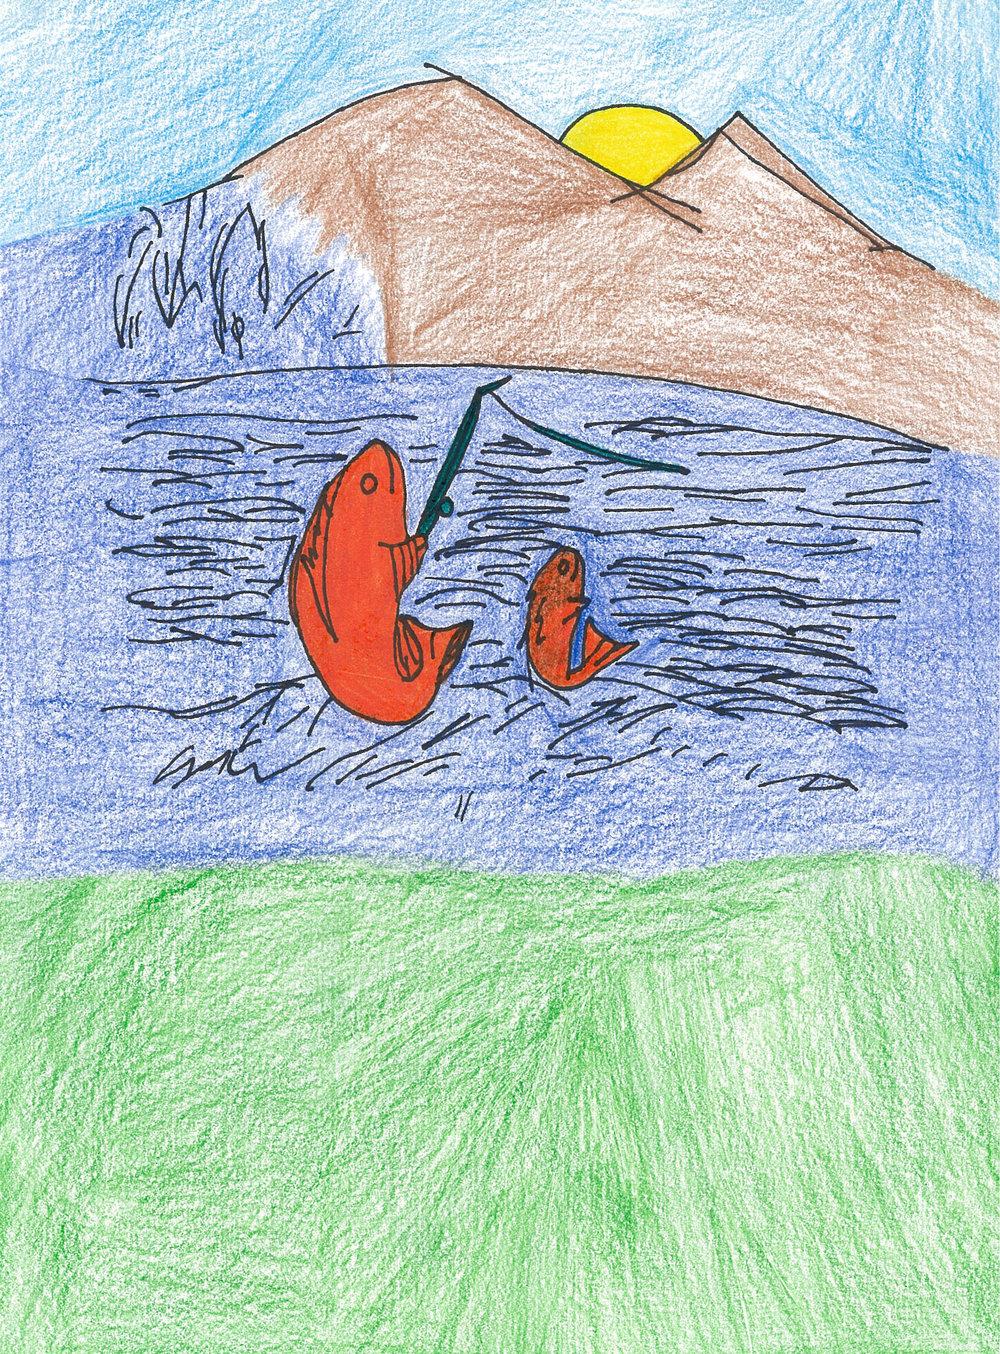 Fishes fishing copy.jpg